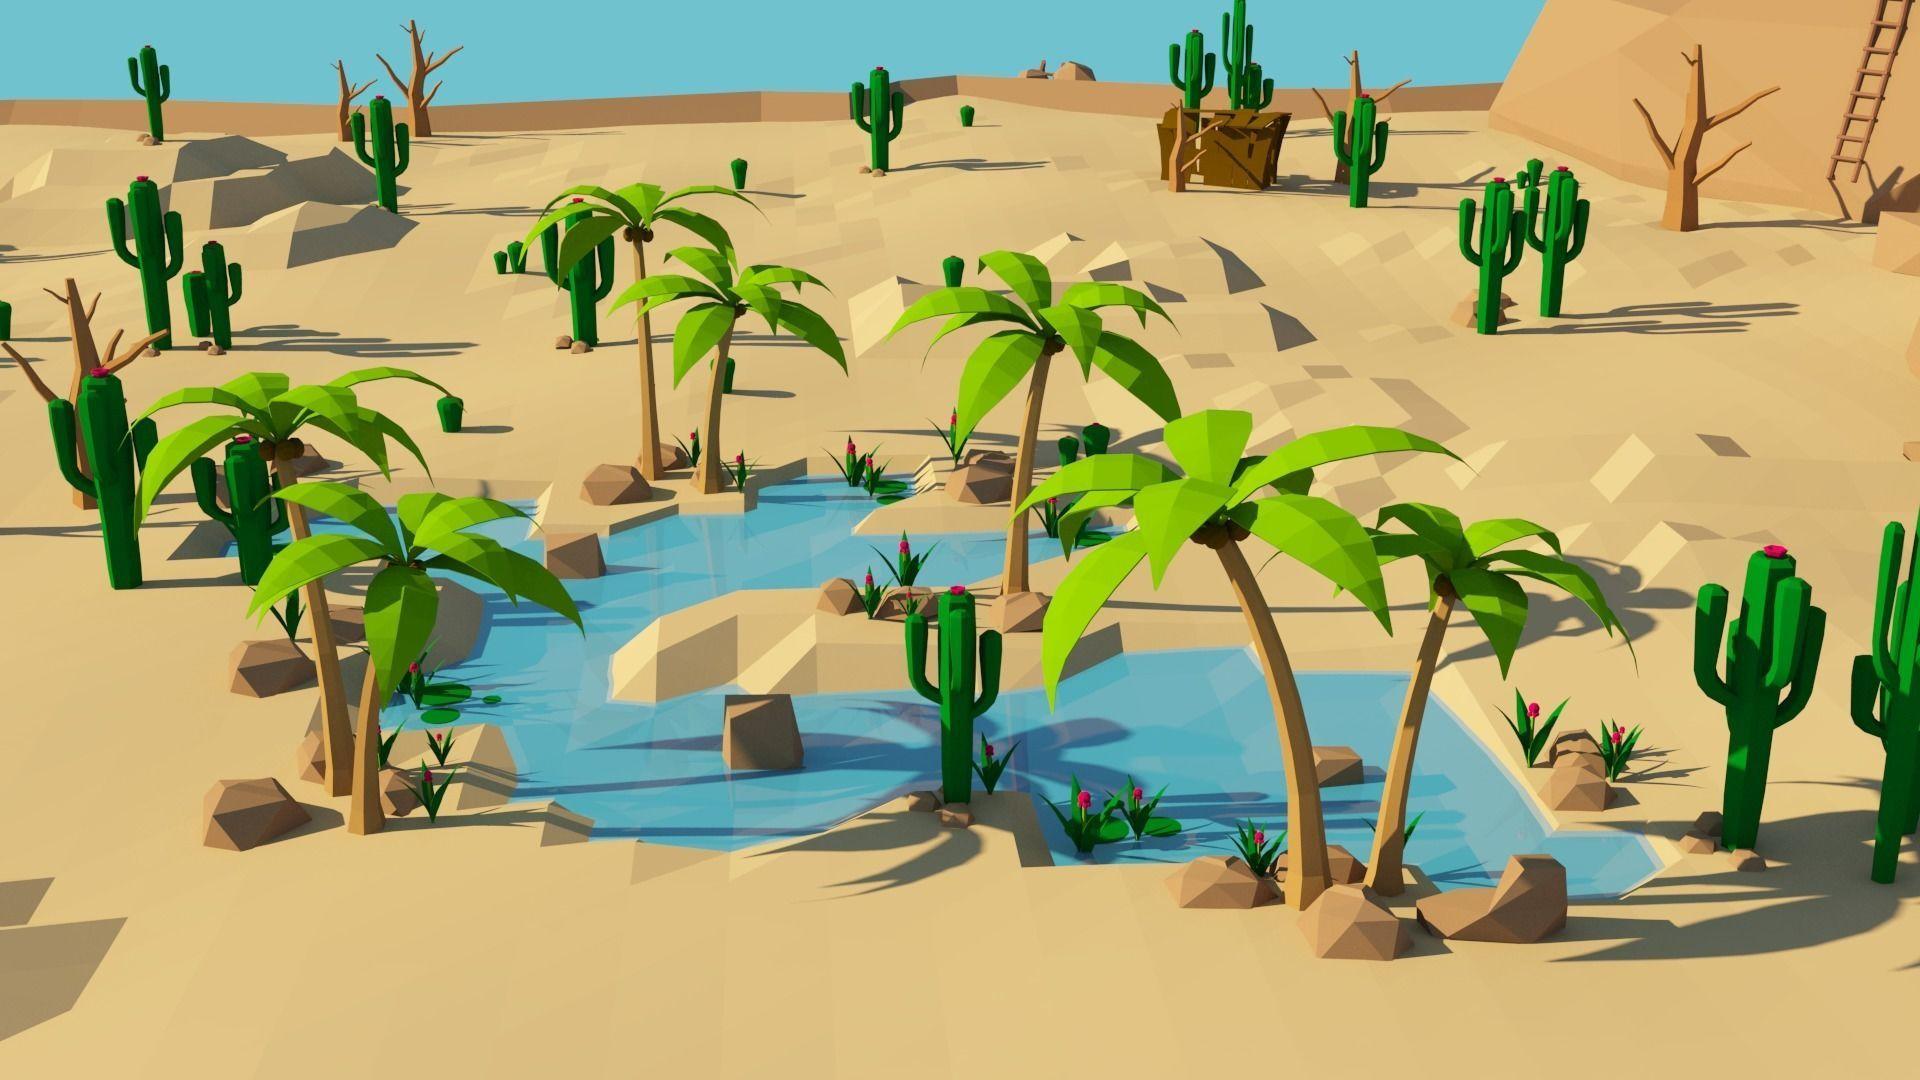 Lowpoly Desert Game Environment Assets - Oasi 3d models